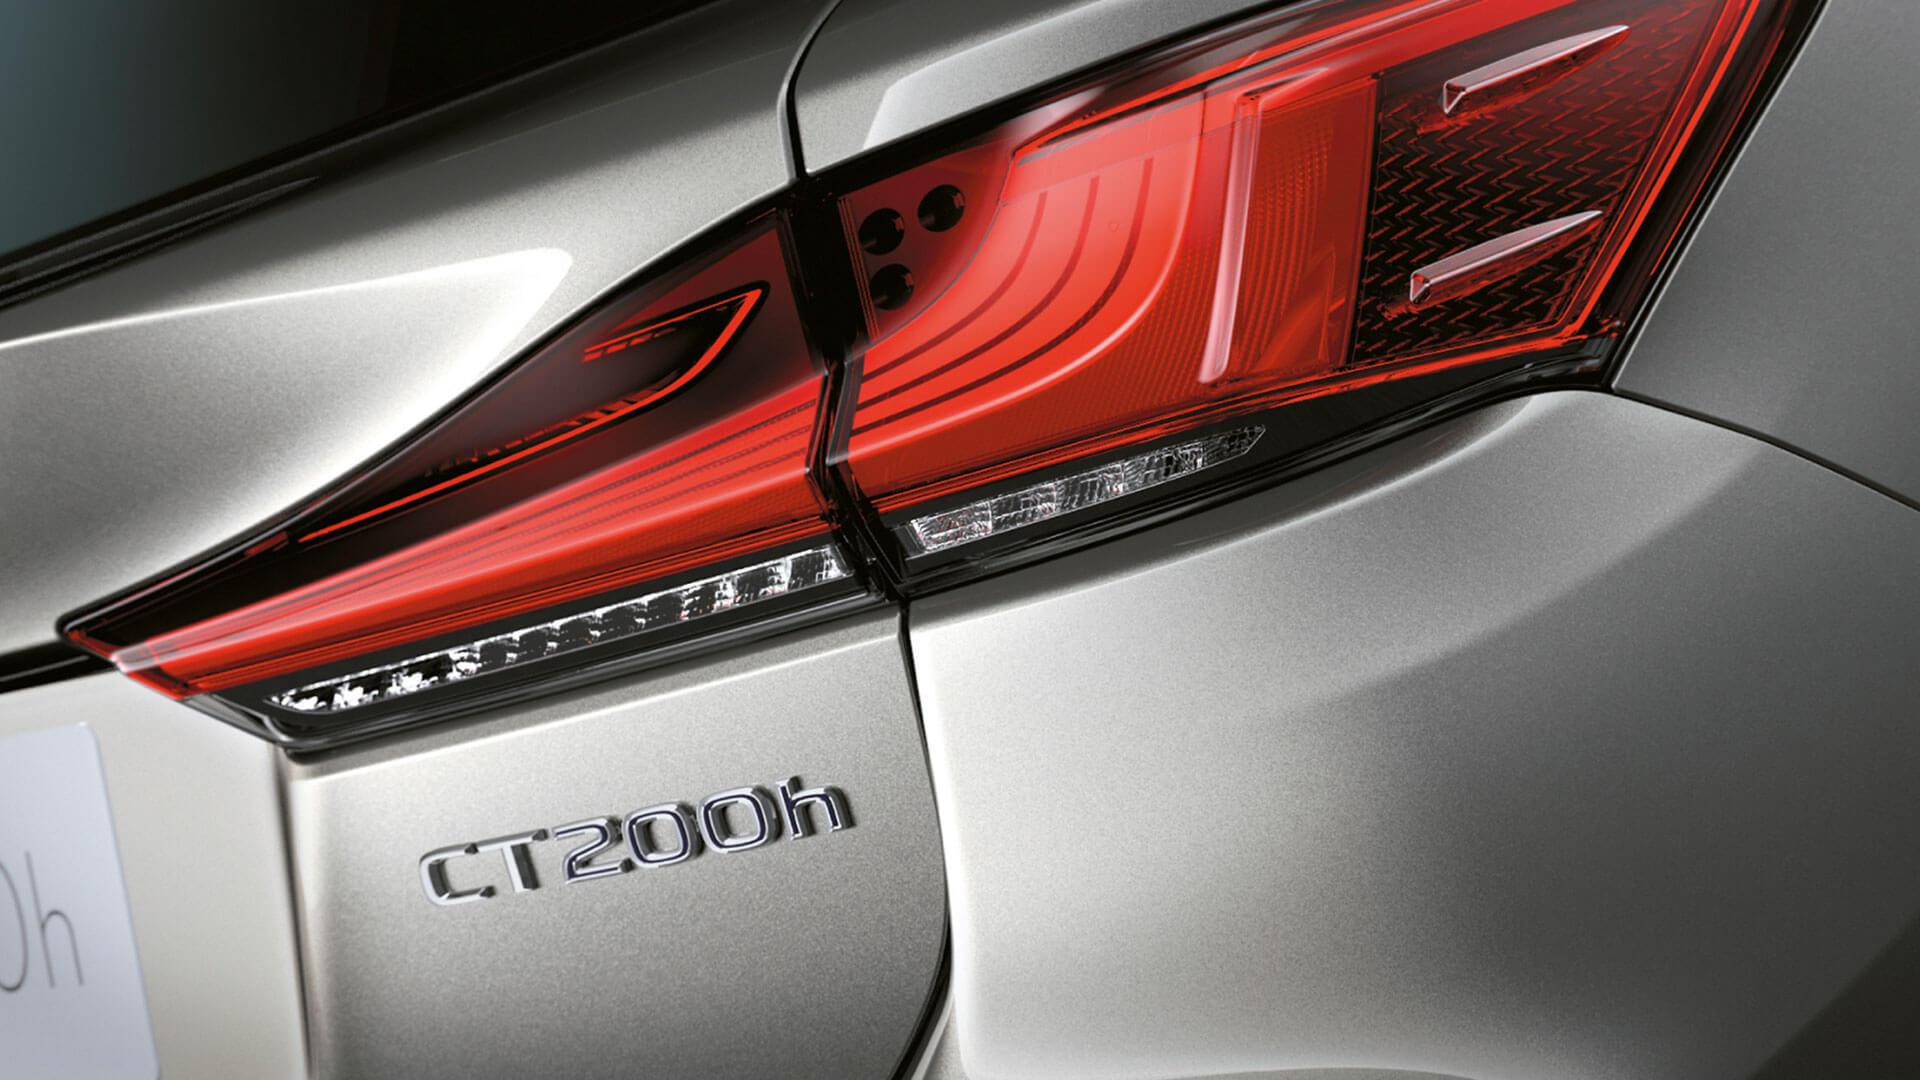 Lexus Ct 200h Hybride Rijden Zonder Stekker Lexus Nl